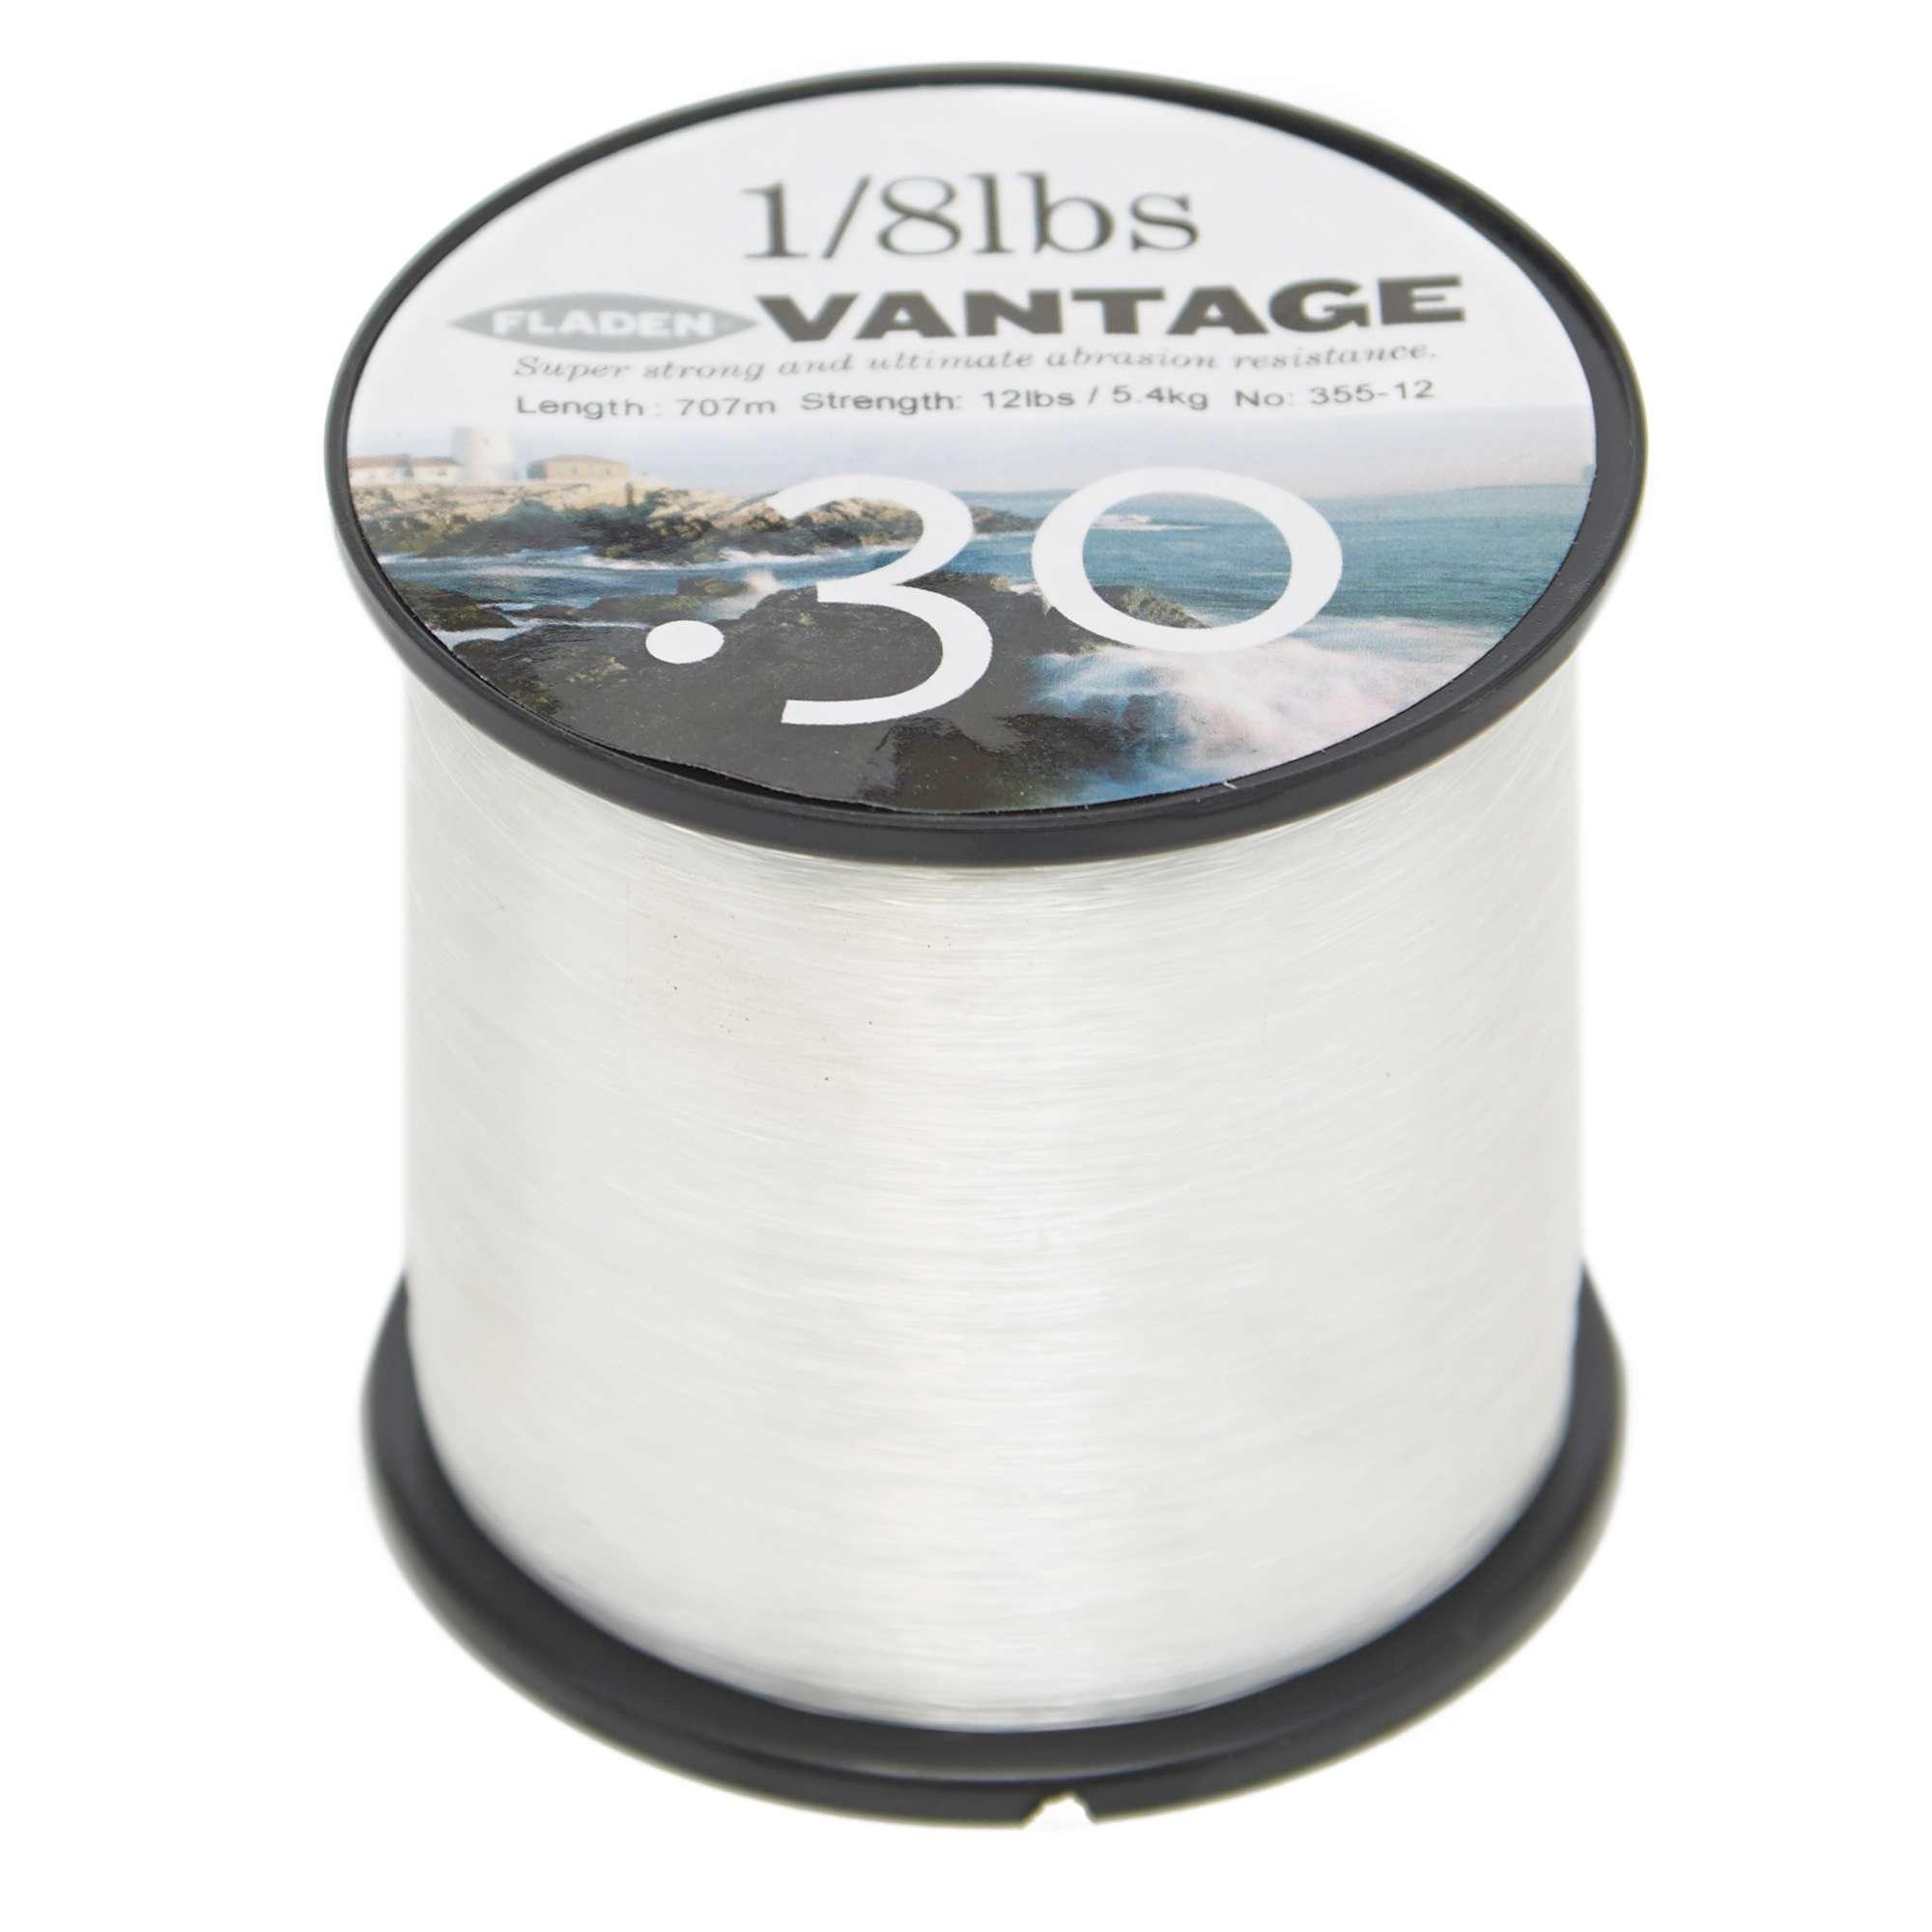 FLADEN Vantage Pro 12lb Clear Fishing Line